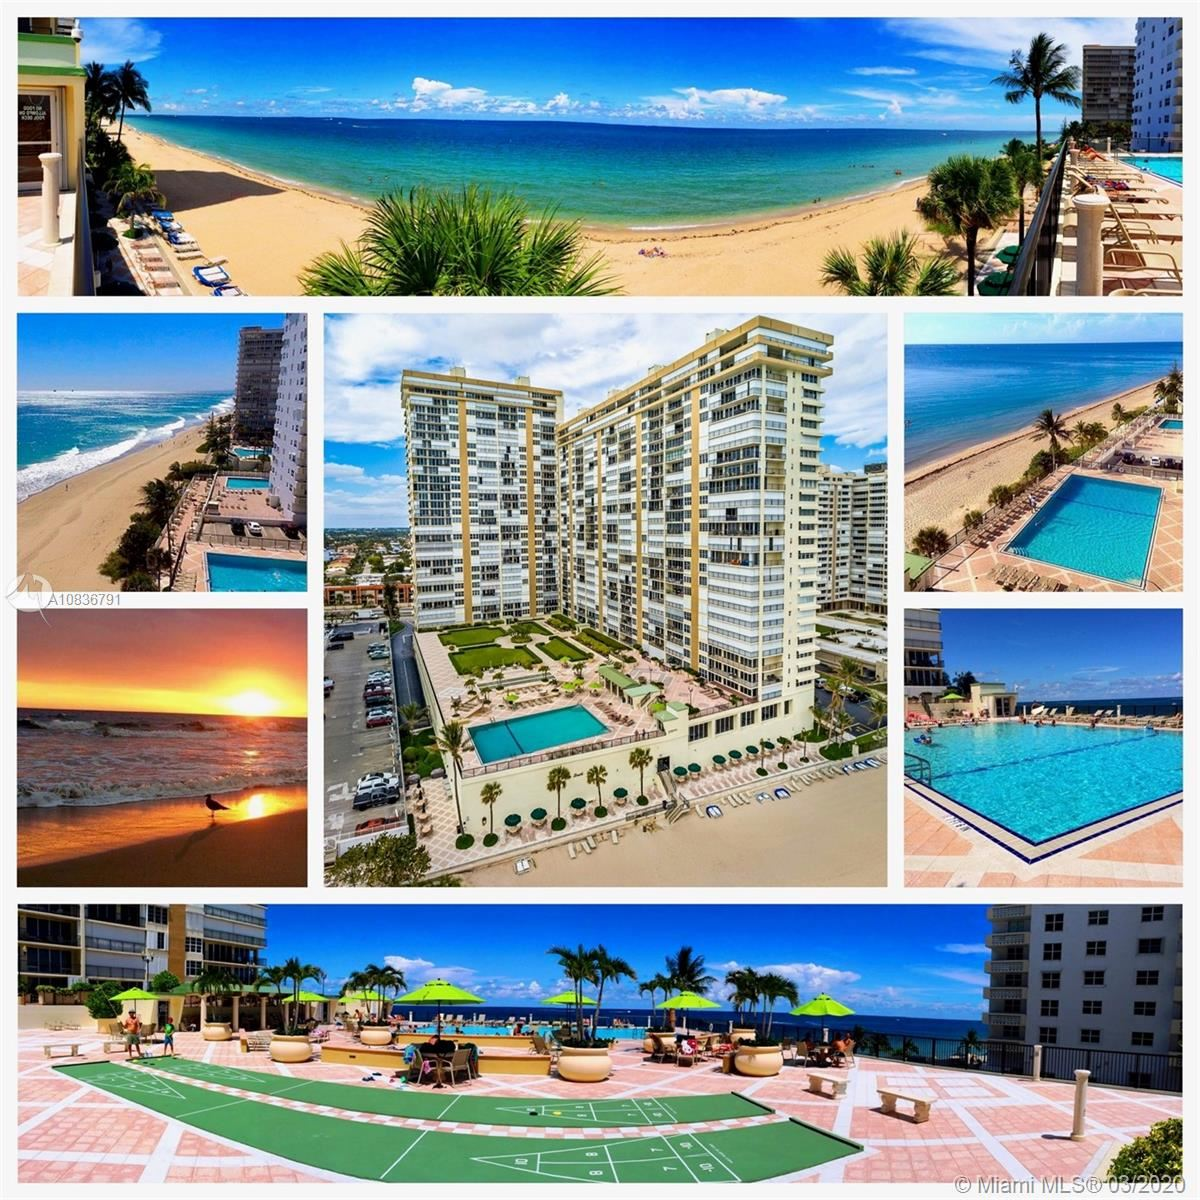 Photo of 4280 Galt Ocean Dr #5F, Fort Lauderdale, FL 33308 (MLS # A10836791)